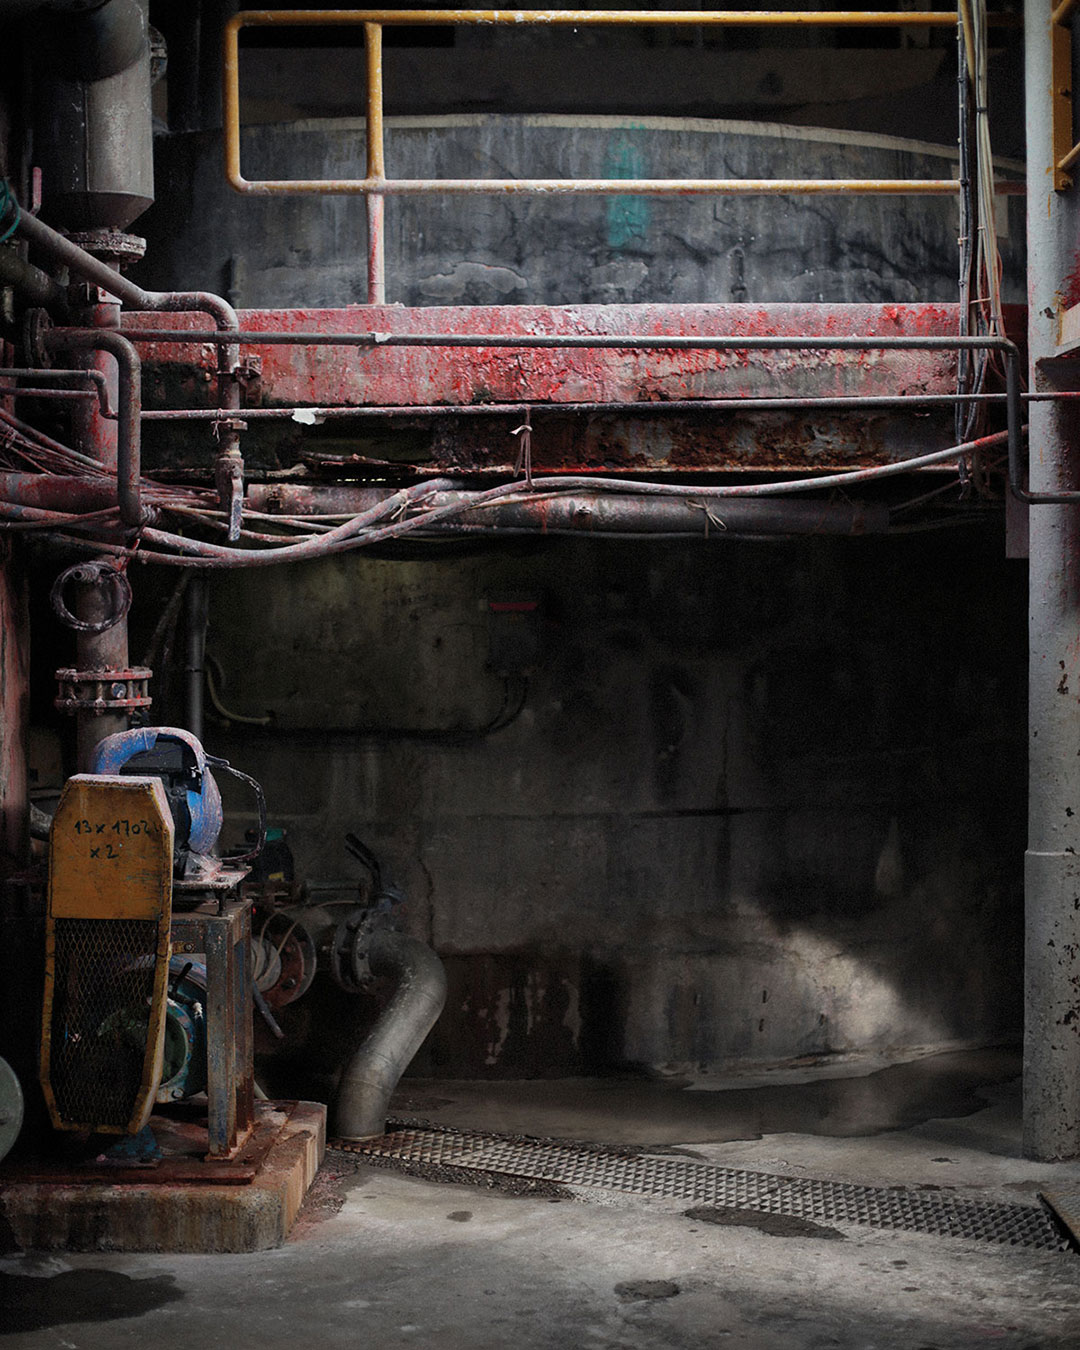 Papeterie Lana à la Robertsau - Photo : Christophe Urbain